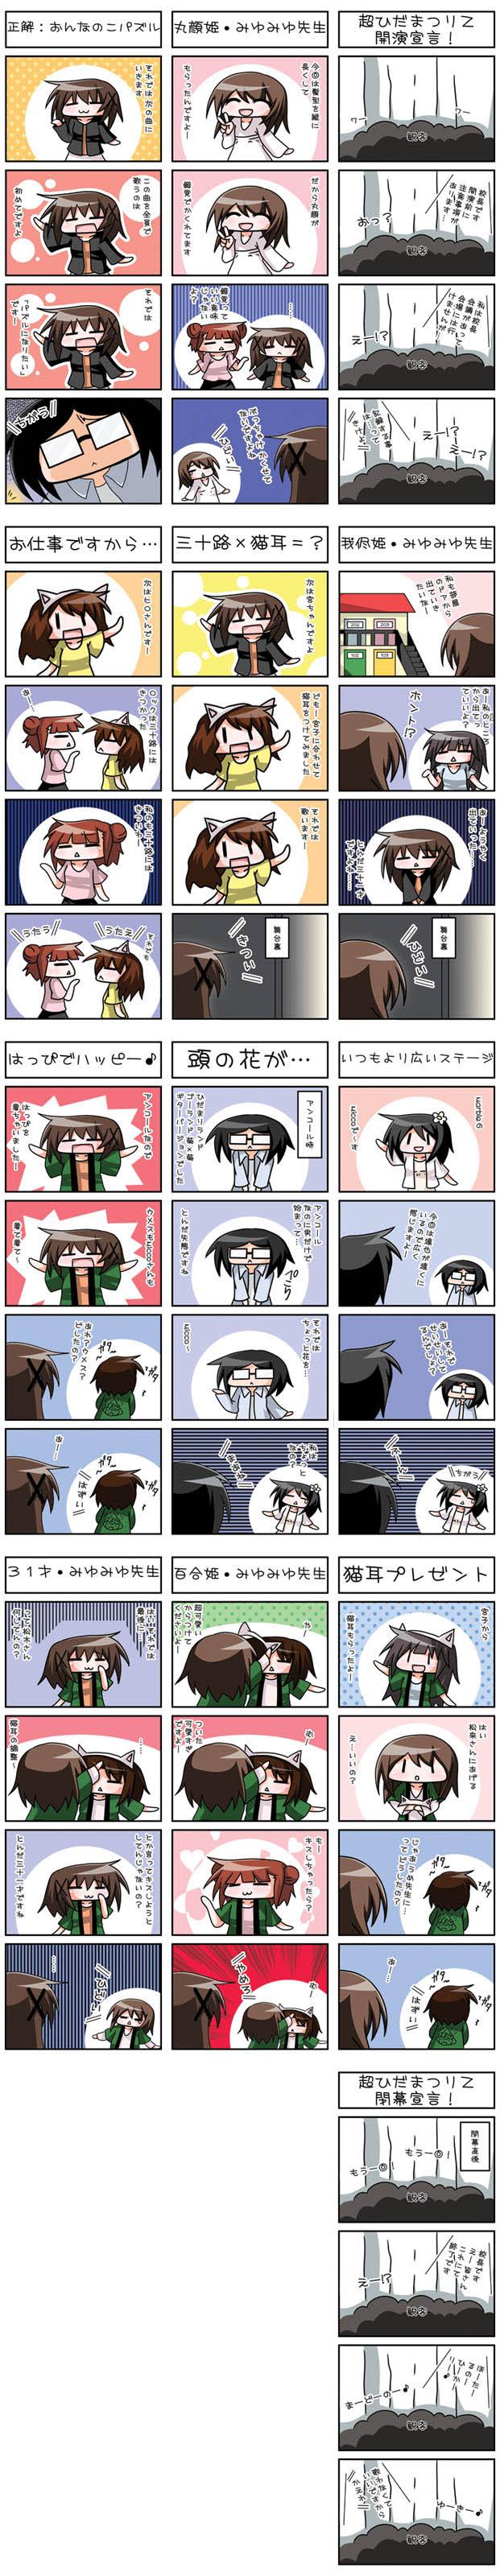 asumi_037-049.jpg